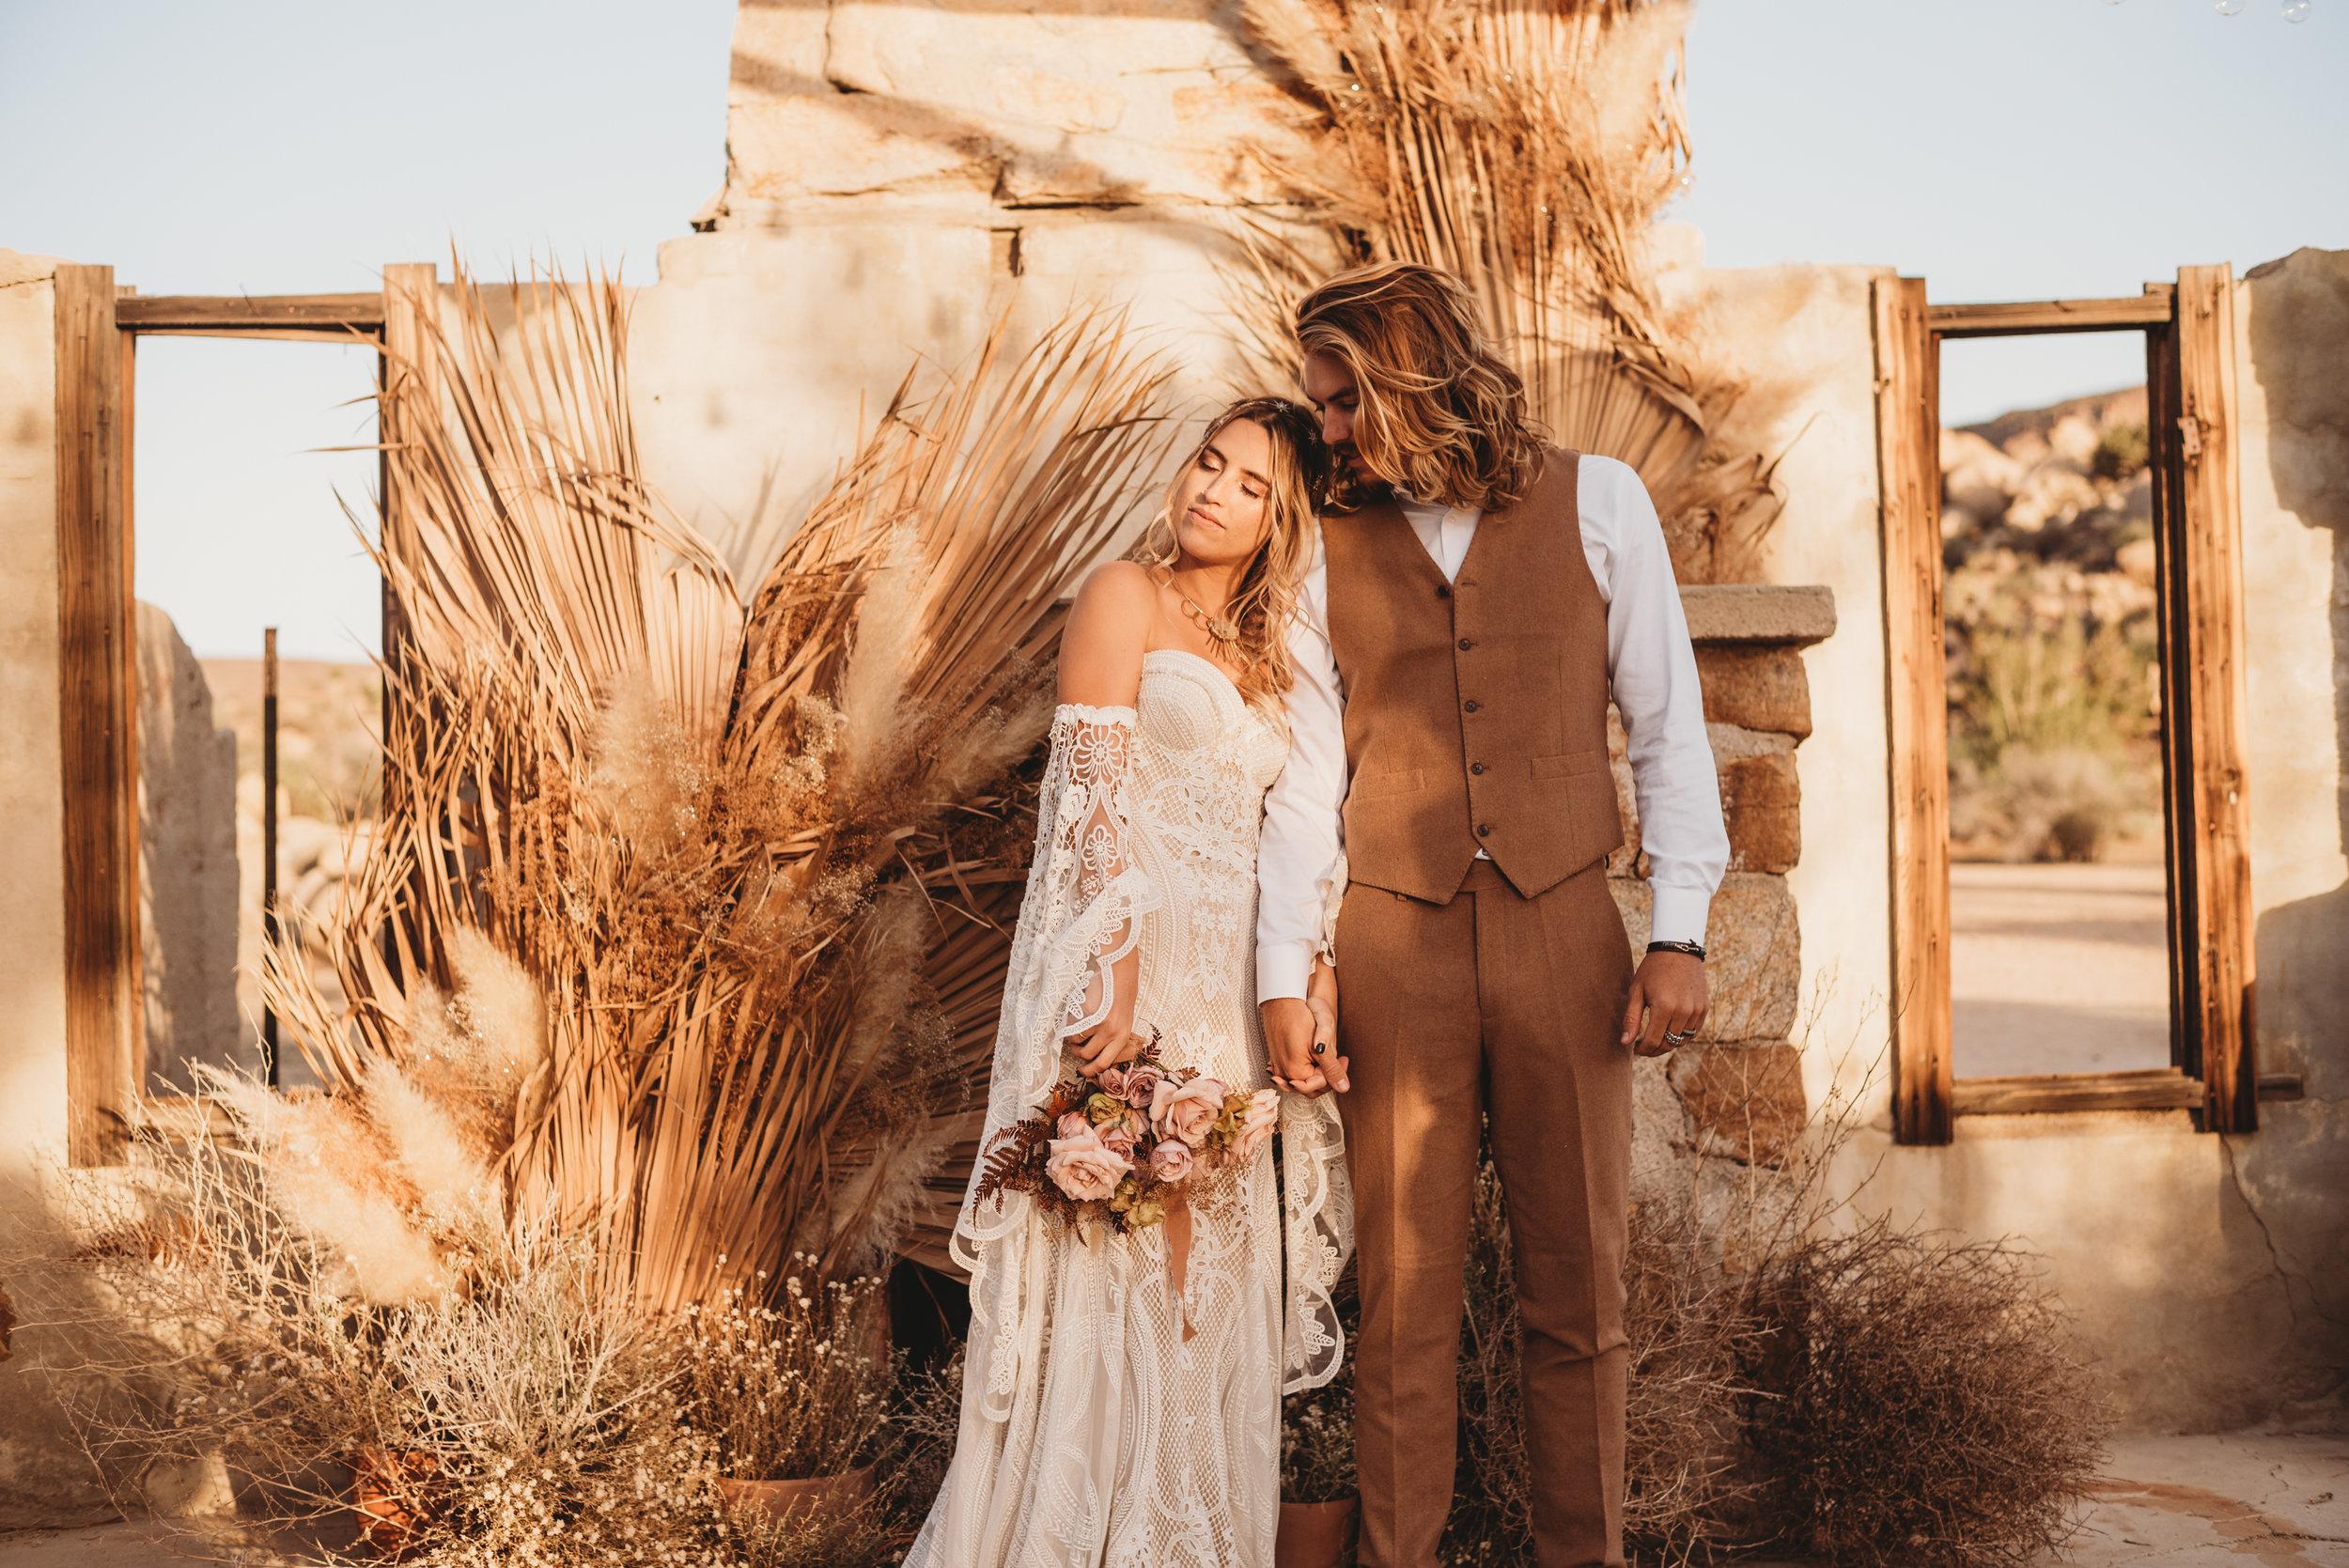 FortSt.John_photographer_TyraEPhotography_Wedding_Couple_Family_Photograhy_DawsonCreek_Elopement_Bride_Boduoir_Portraits-8257.jpg